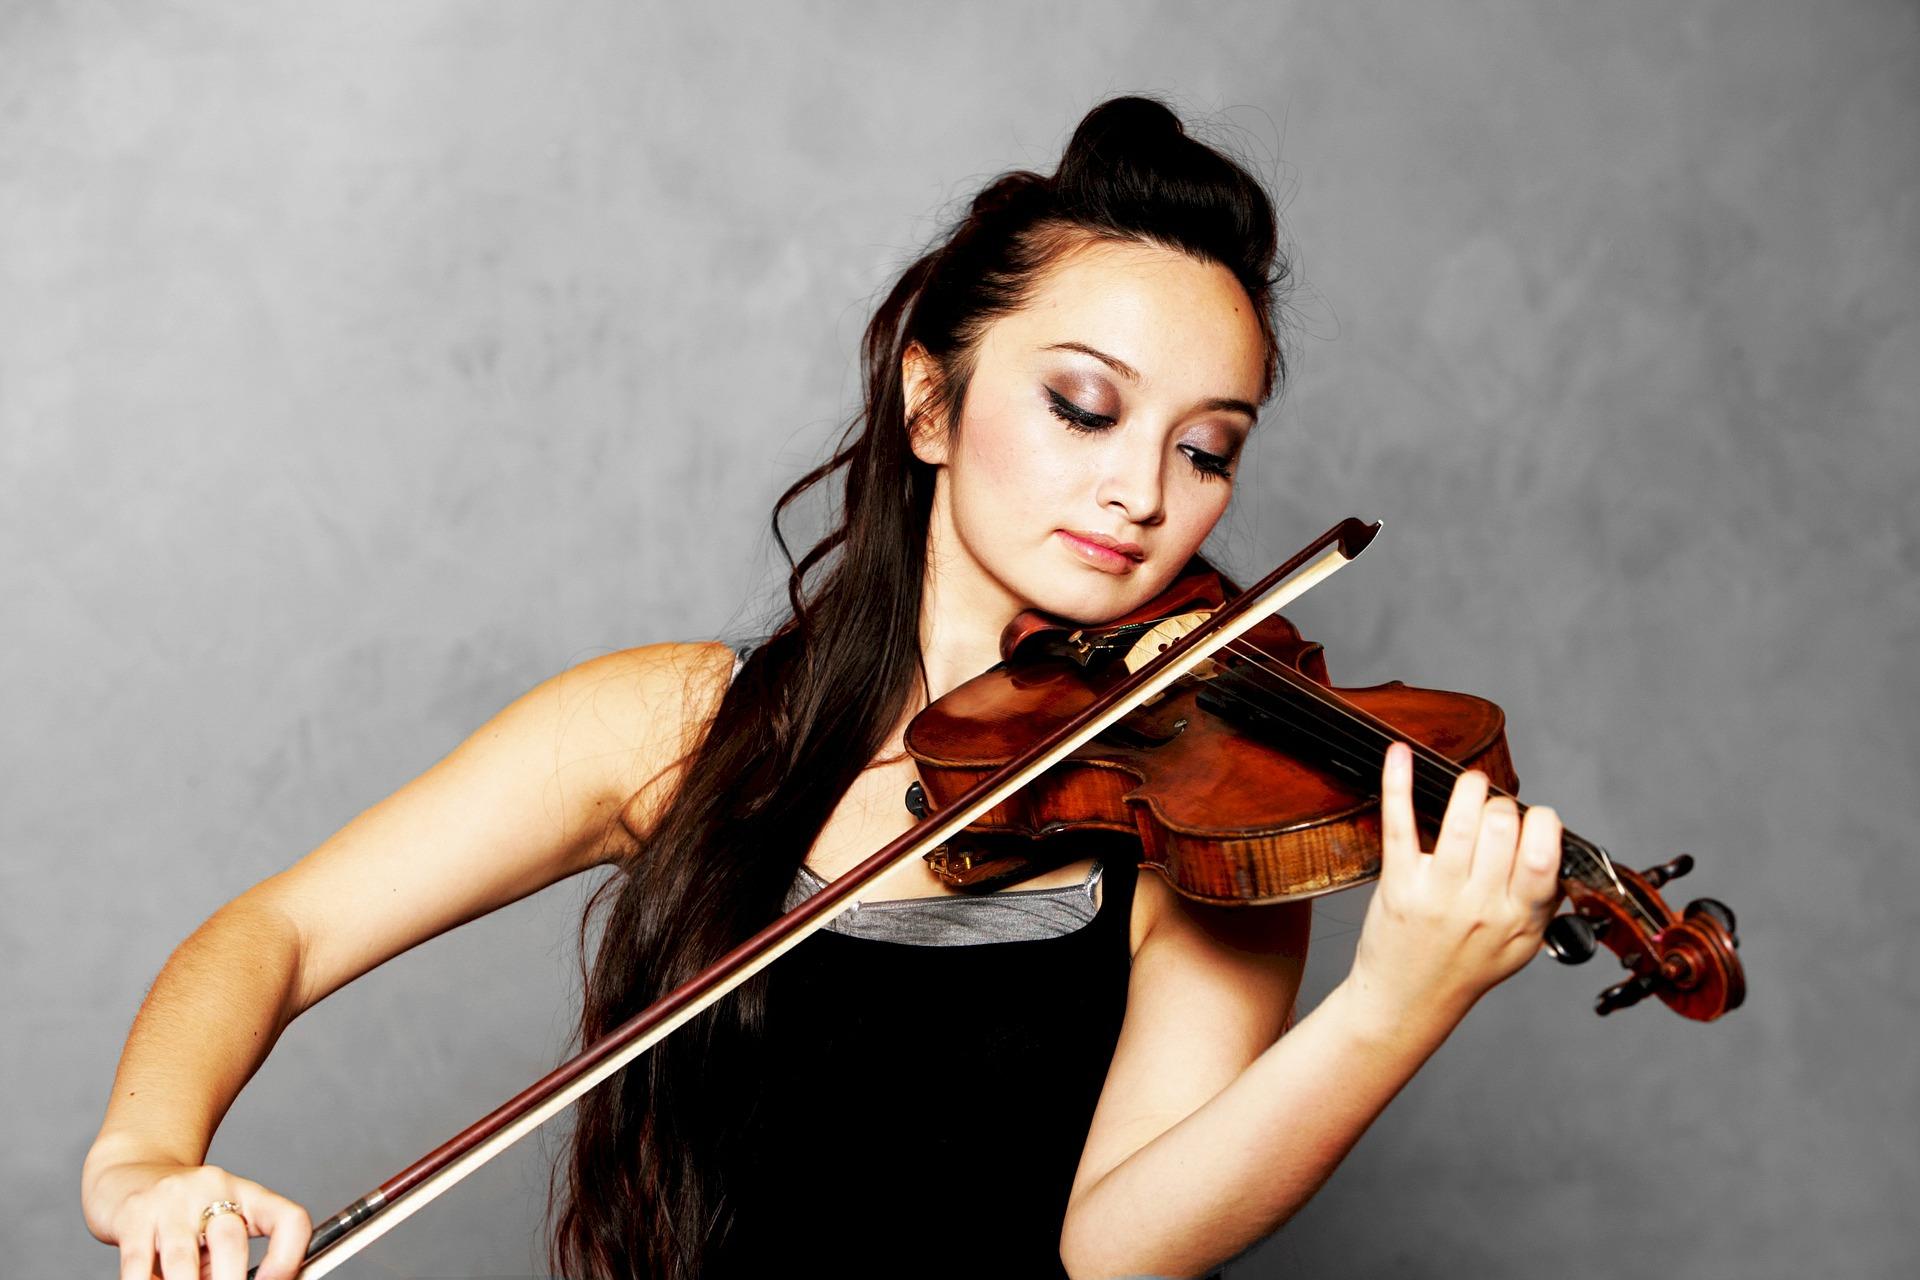 musiker musik komponist violin